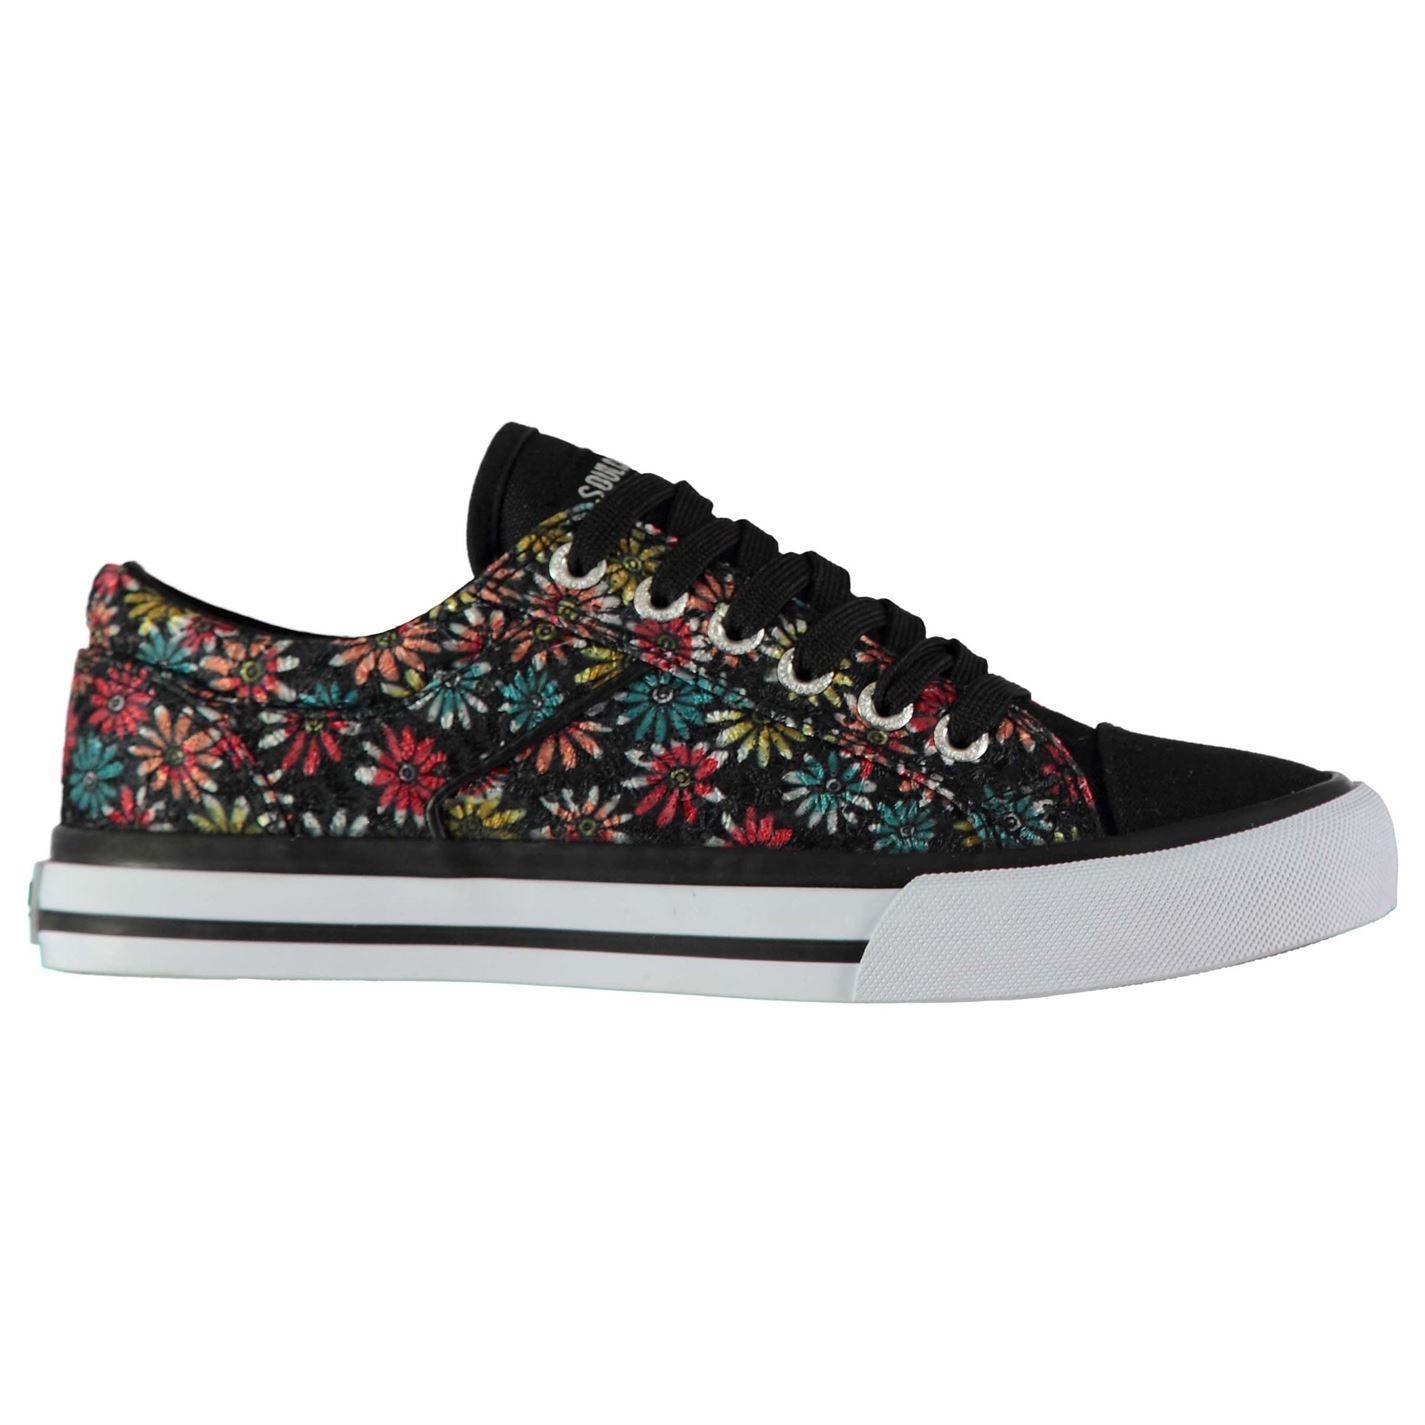 Asti 4rj35la De Soulcal Zapatillas Low Calzado Lona Zapatos Girls UzSMpV